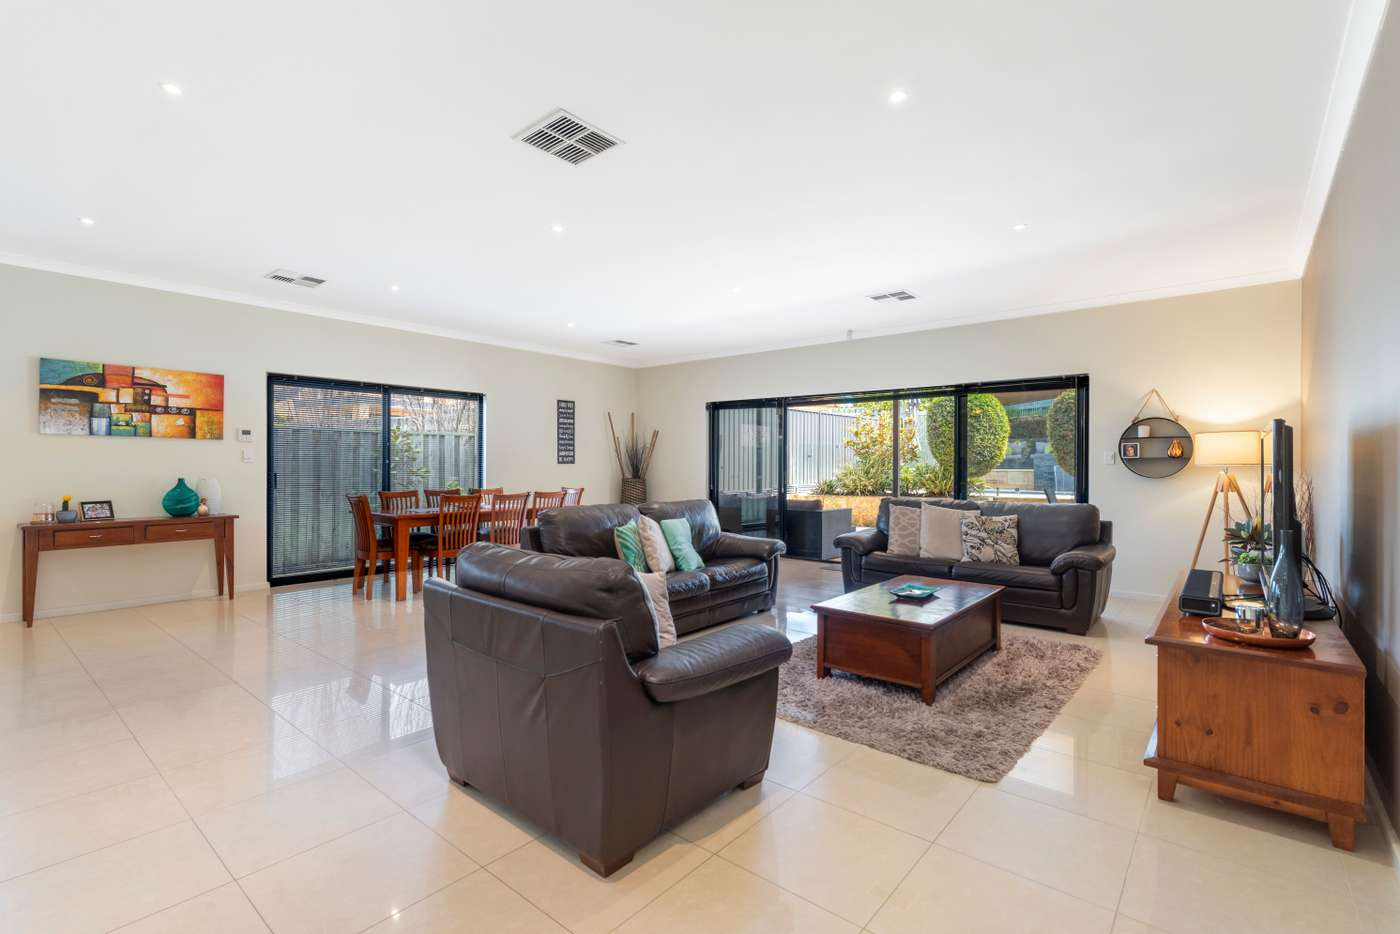 Sixth view of Homely house listing, 27 La Grange Loop, Currambine WA 6028